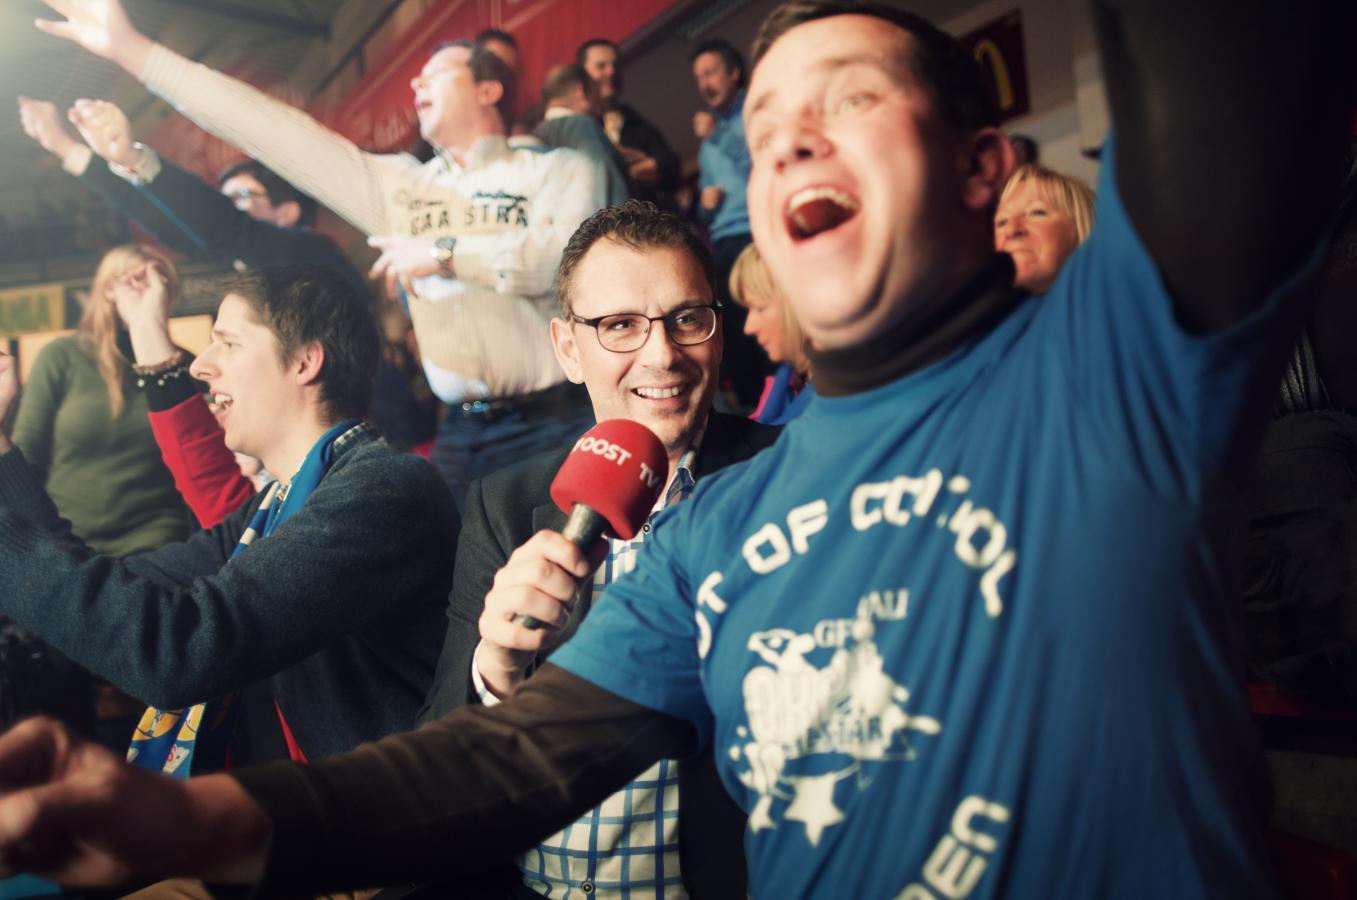 tv-oost-image-campaign-2013-basket